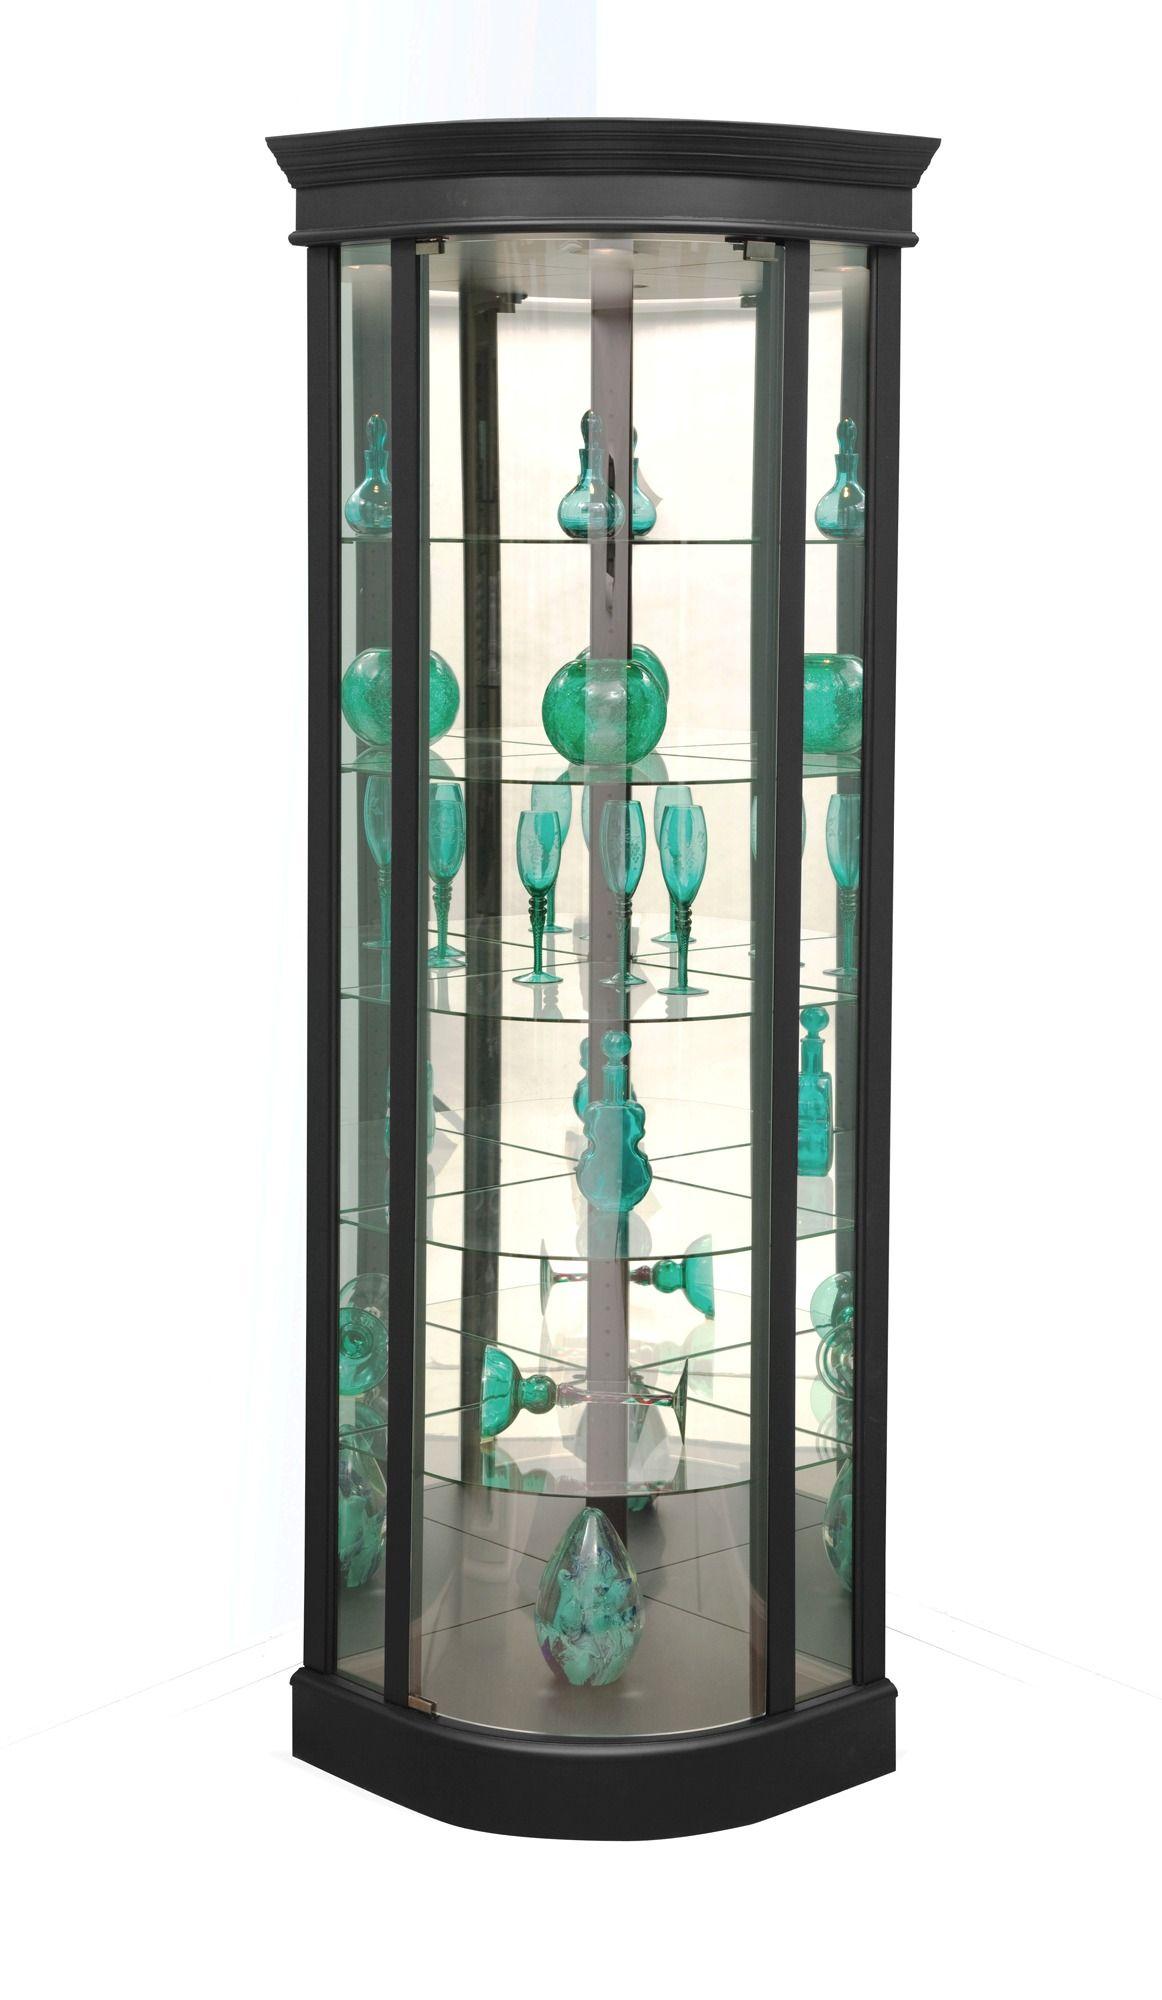 Auberge Iii Curved Corner Curio Cabinet In Black By Philip Reinisch